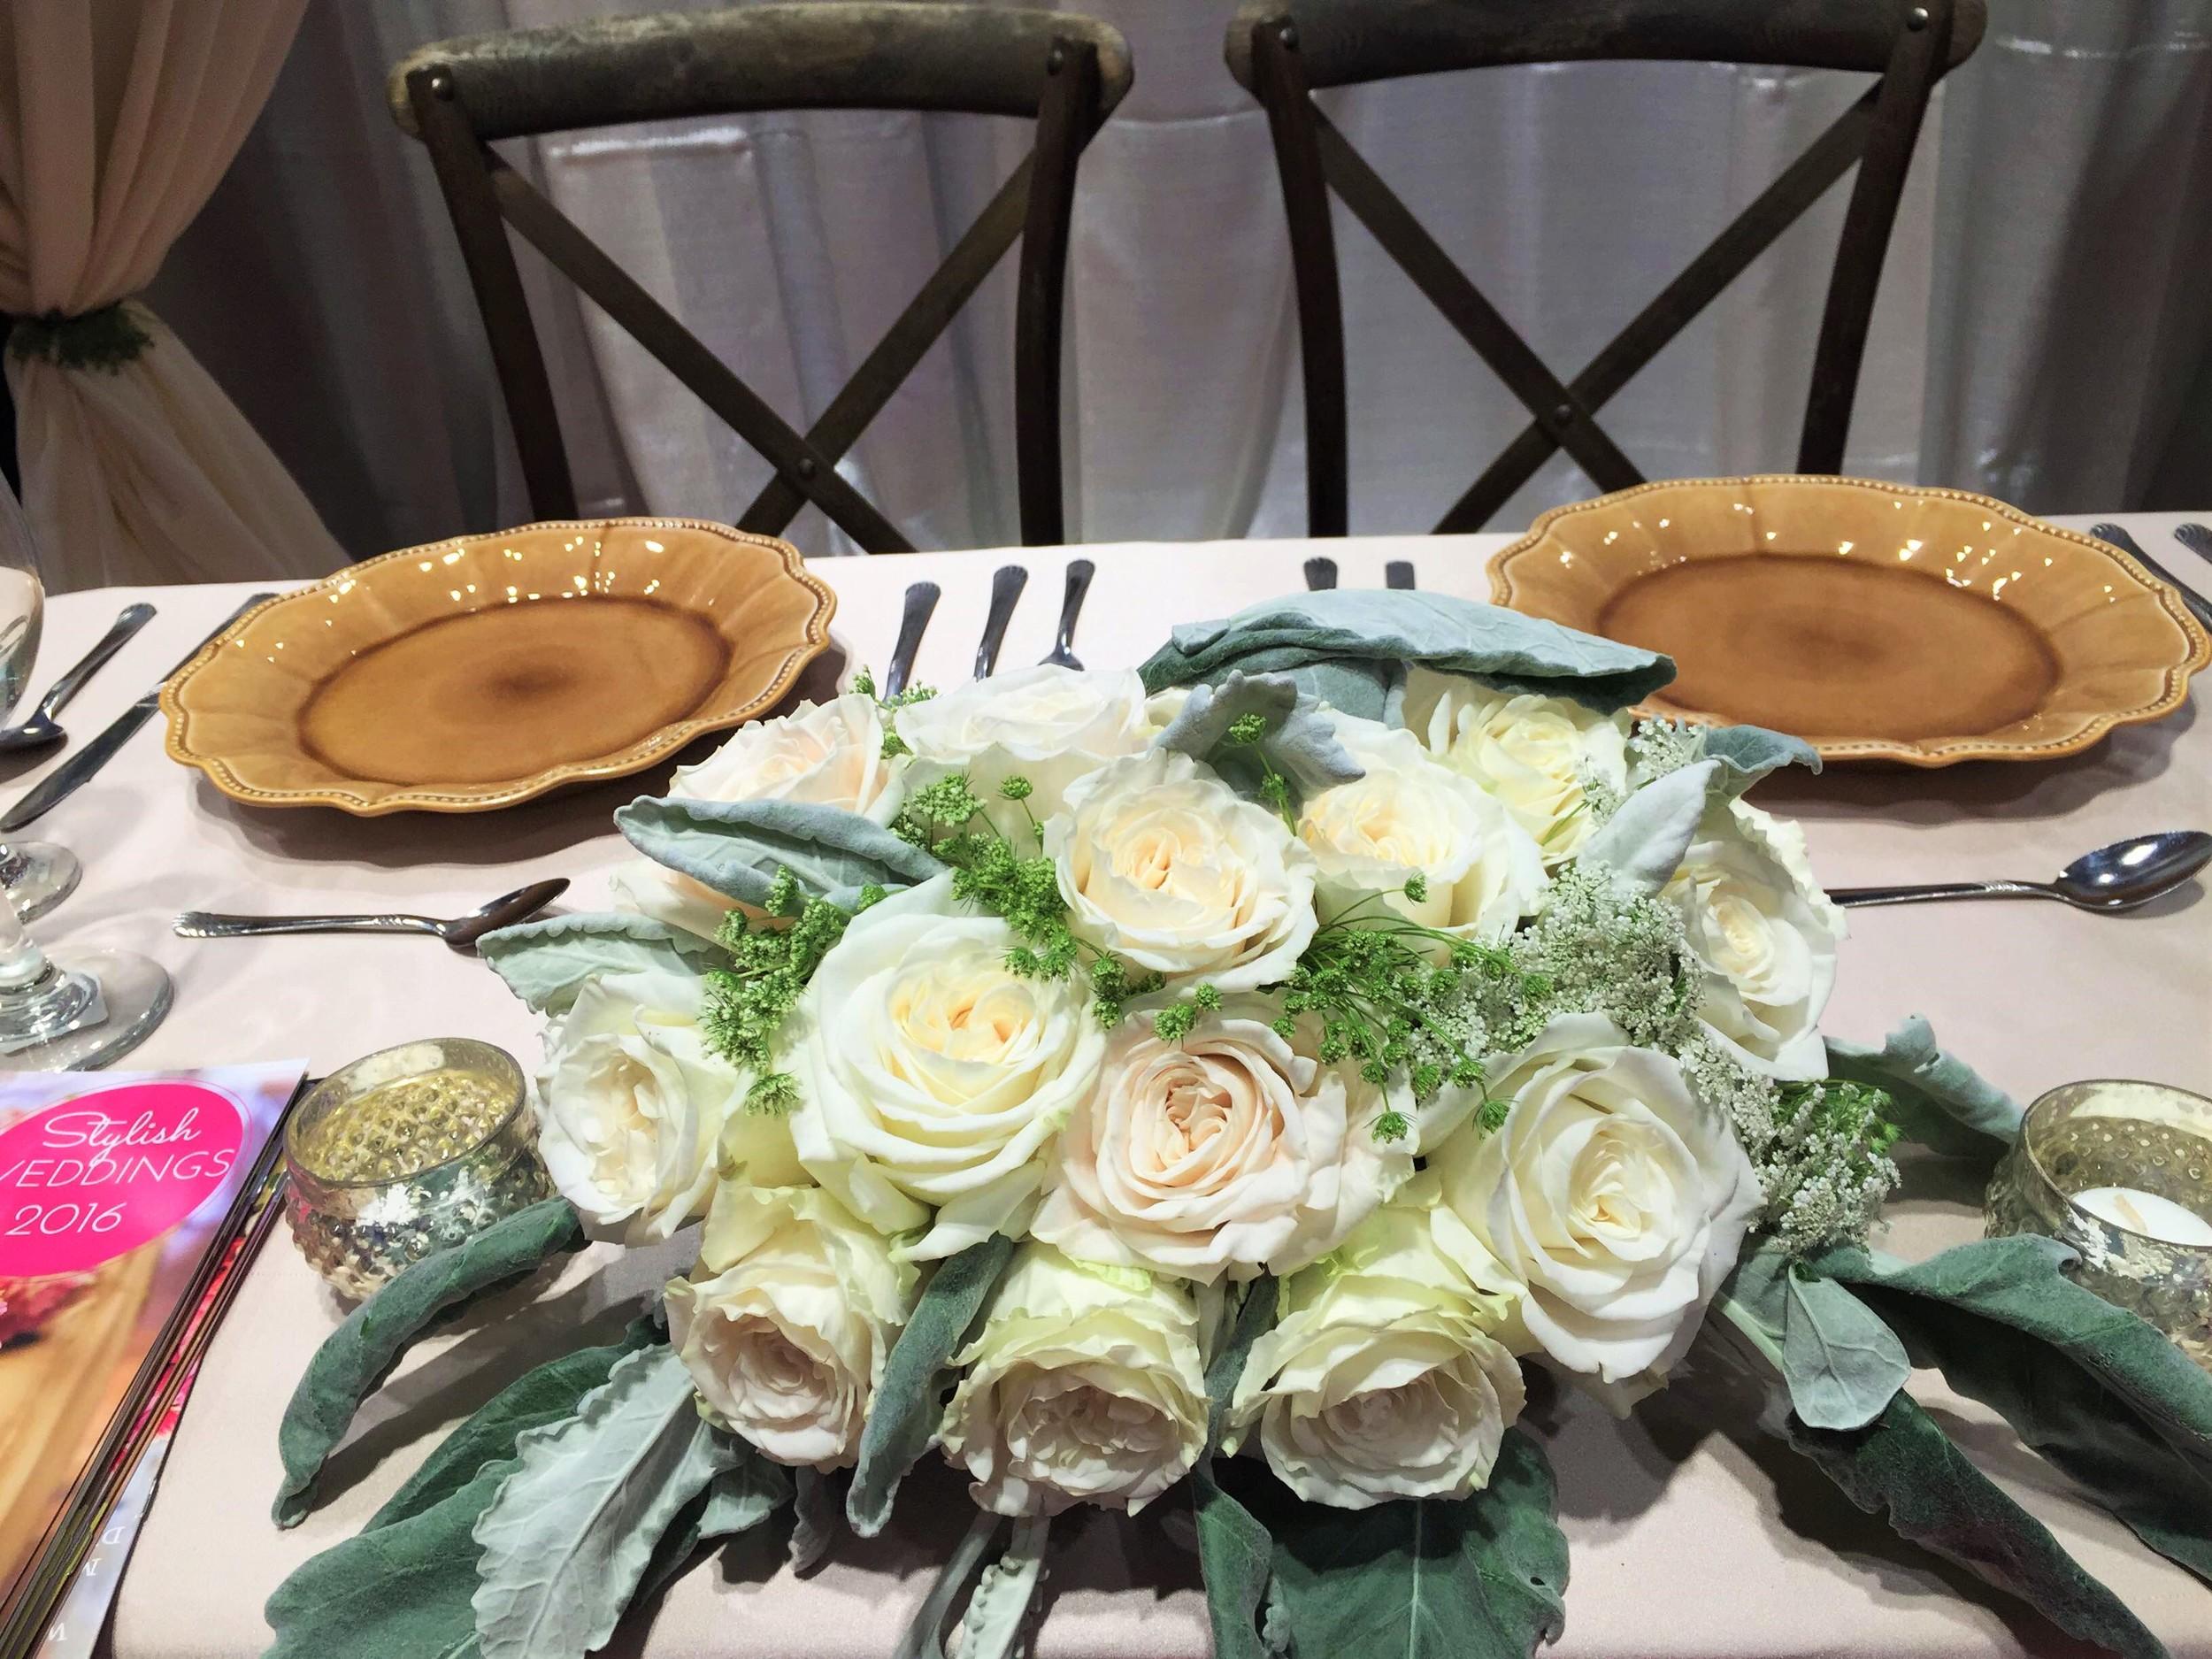 Sweet Hearts Table, Dells Wedding Barn, Wisconsin Dells Weddings